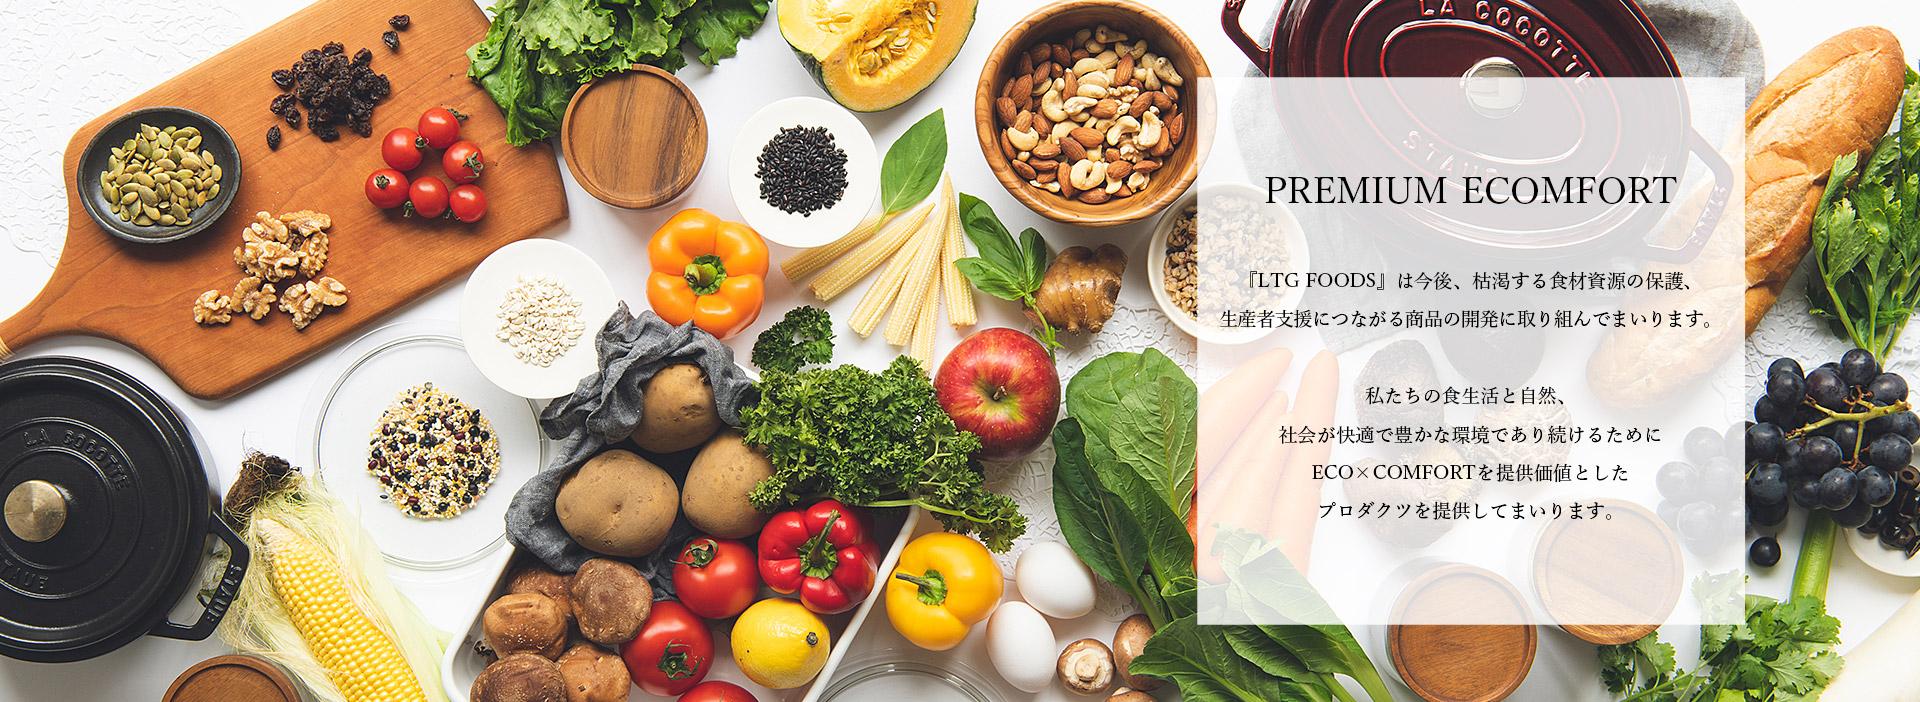 LTG FOODS|食と環境への関心が高い方々に、 化学調味料不使用・ナチュラル志向のプロダクツを提供してまいります。